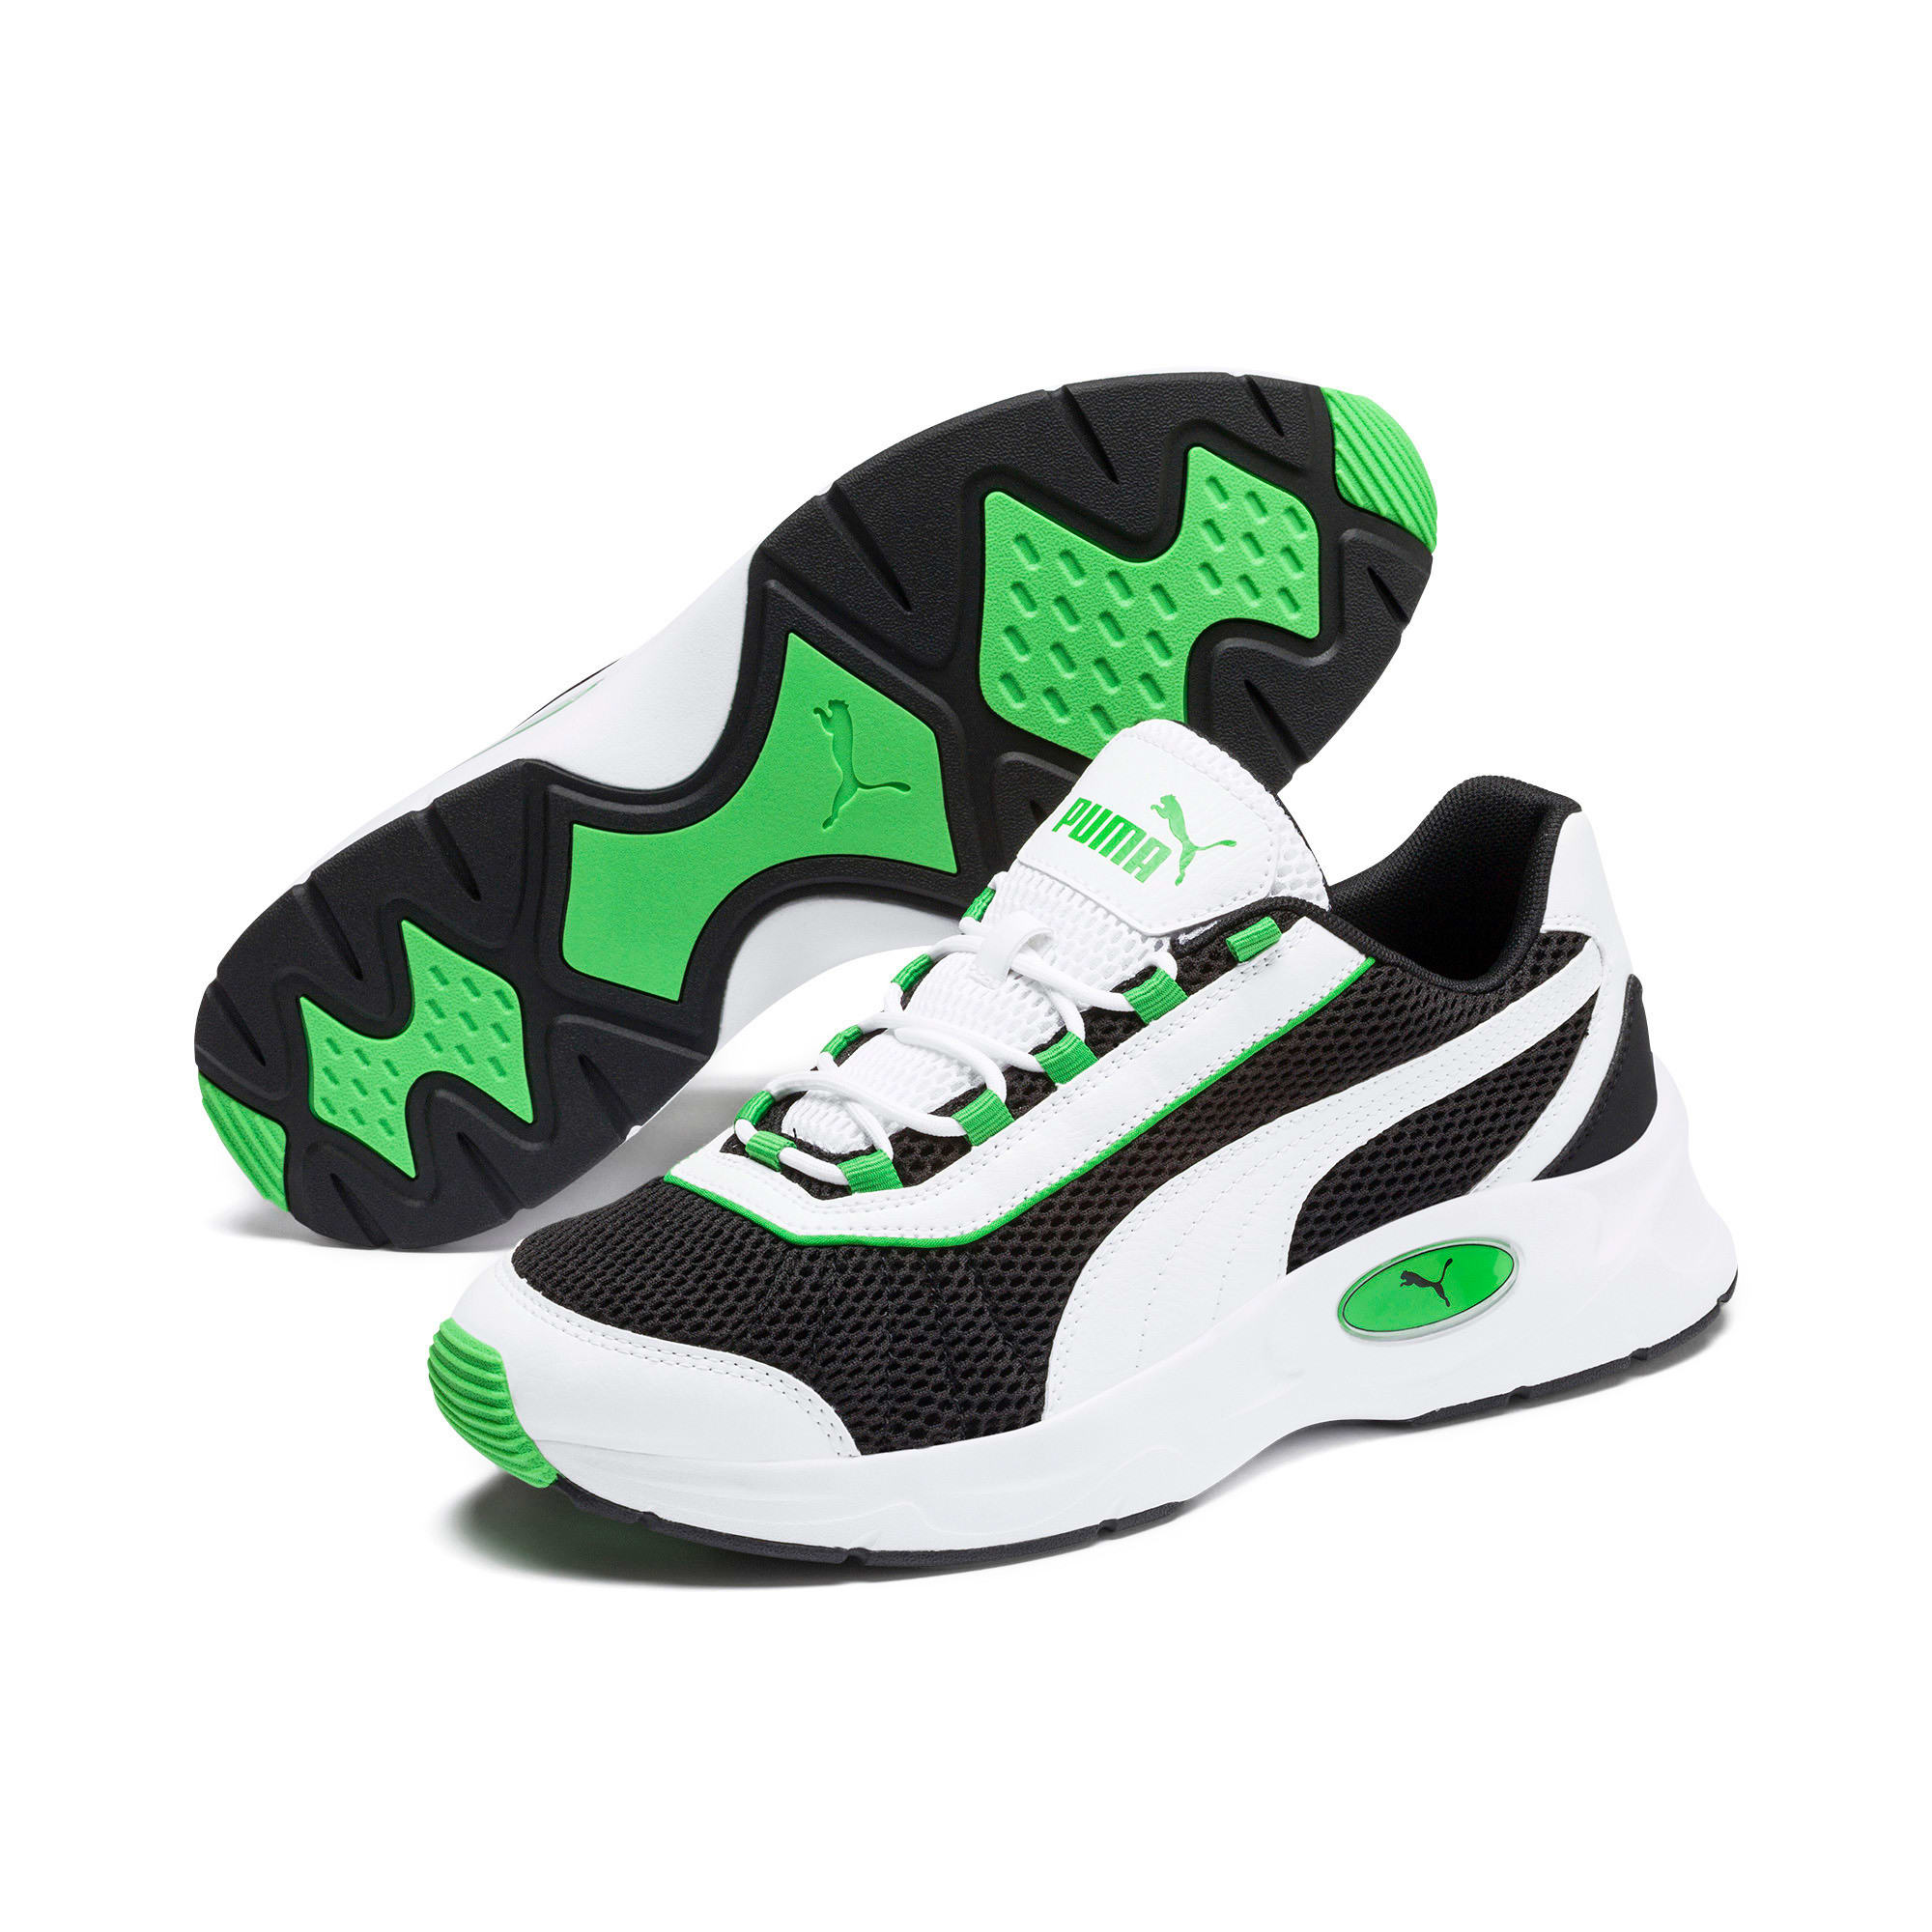 Imagen en miniatura 3 de Zapatillas de training Nucleus, Puma Black-Classic Green, mediana